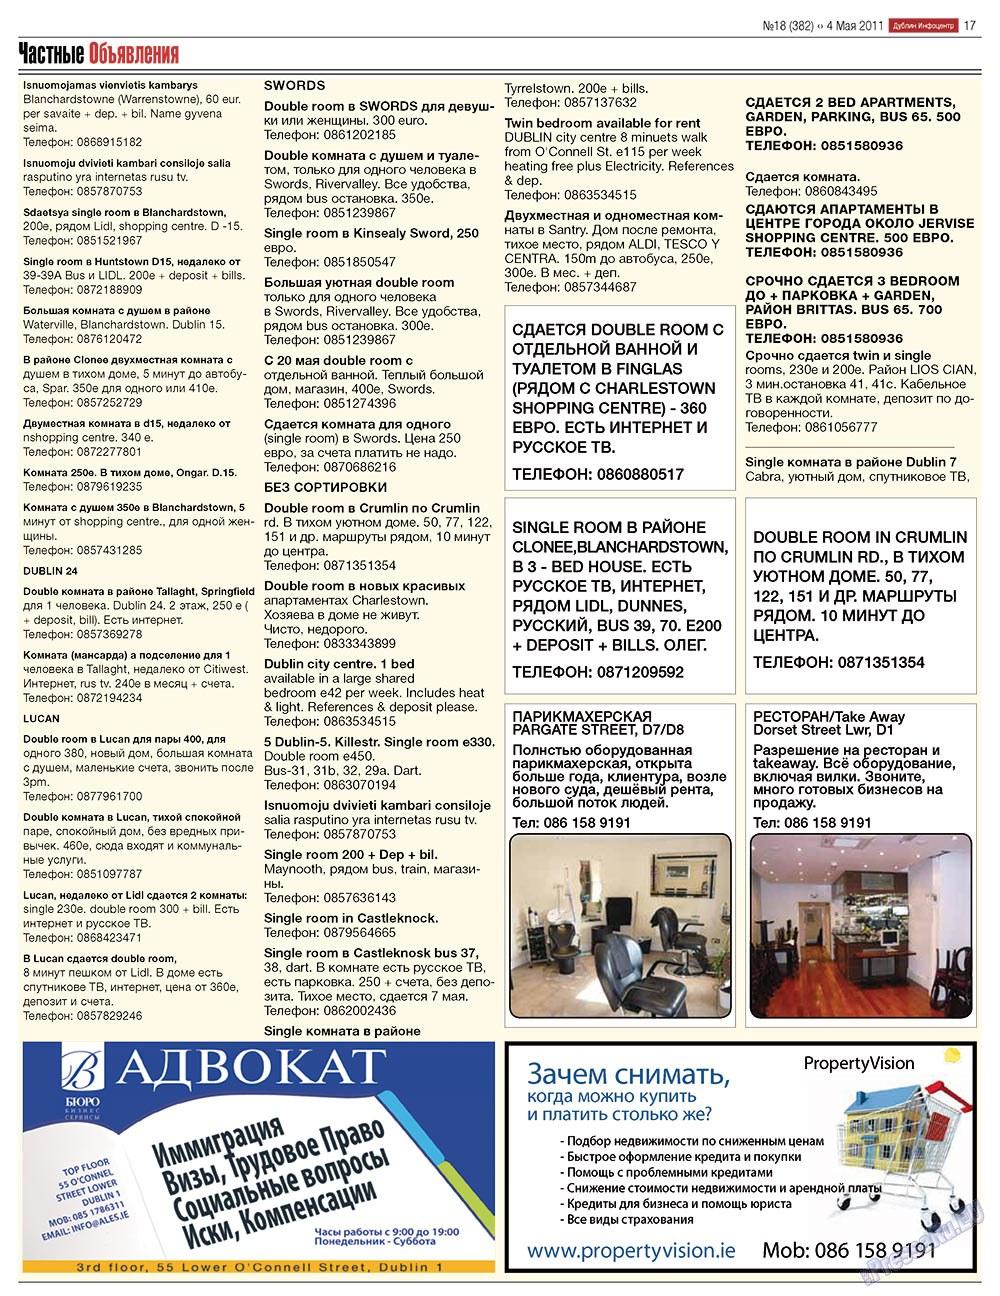 Дублин инфоцентр (газета). 2011 год, номер 18, стр. 17